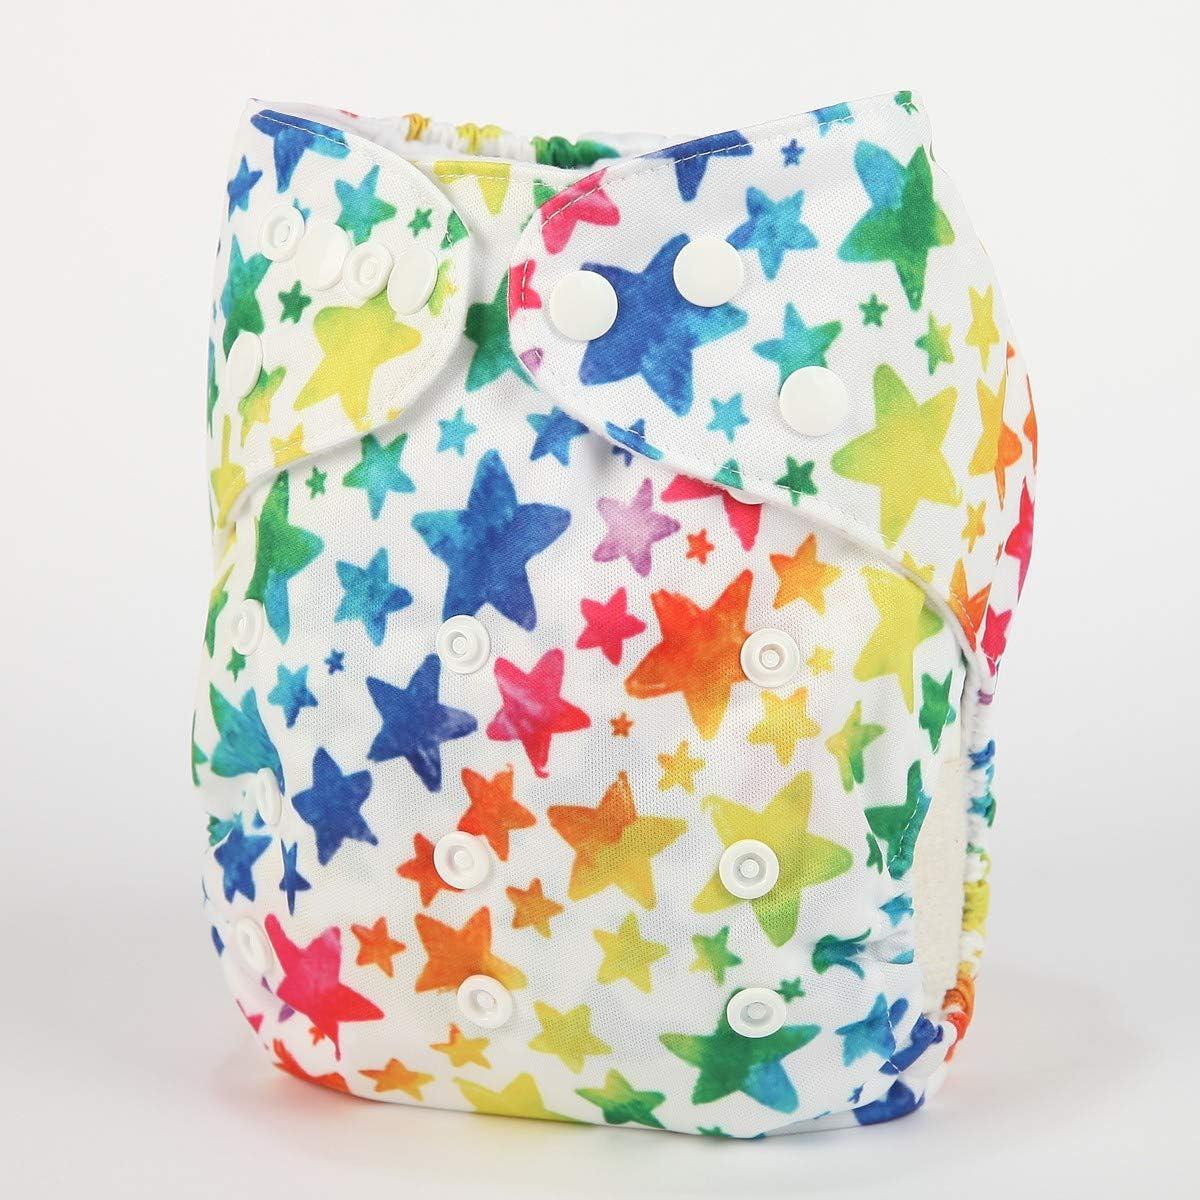 Sigzagor Baby Pocket Diaper Nappy Reusable Washable 8lbs to 36lbs XOXO